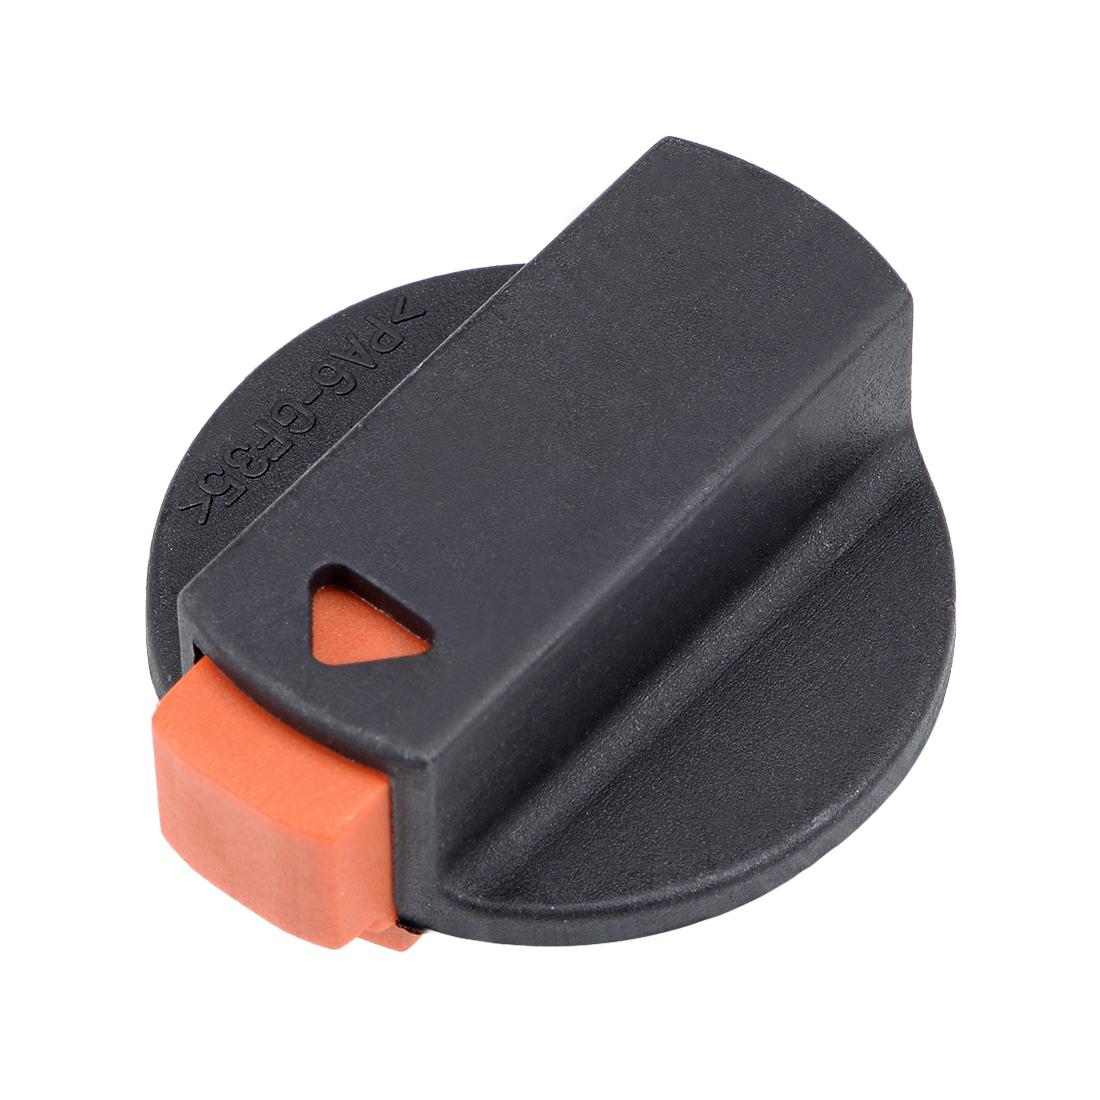 Electric Drill Hammer Trigger Switch Knob Tool Power Adjusting Gear #13